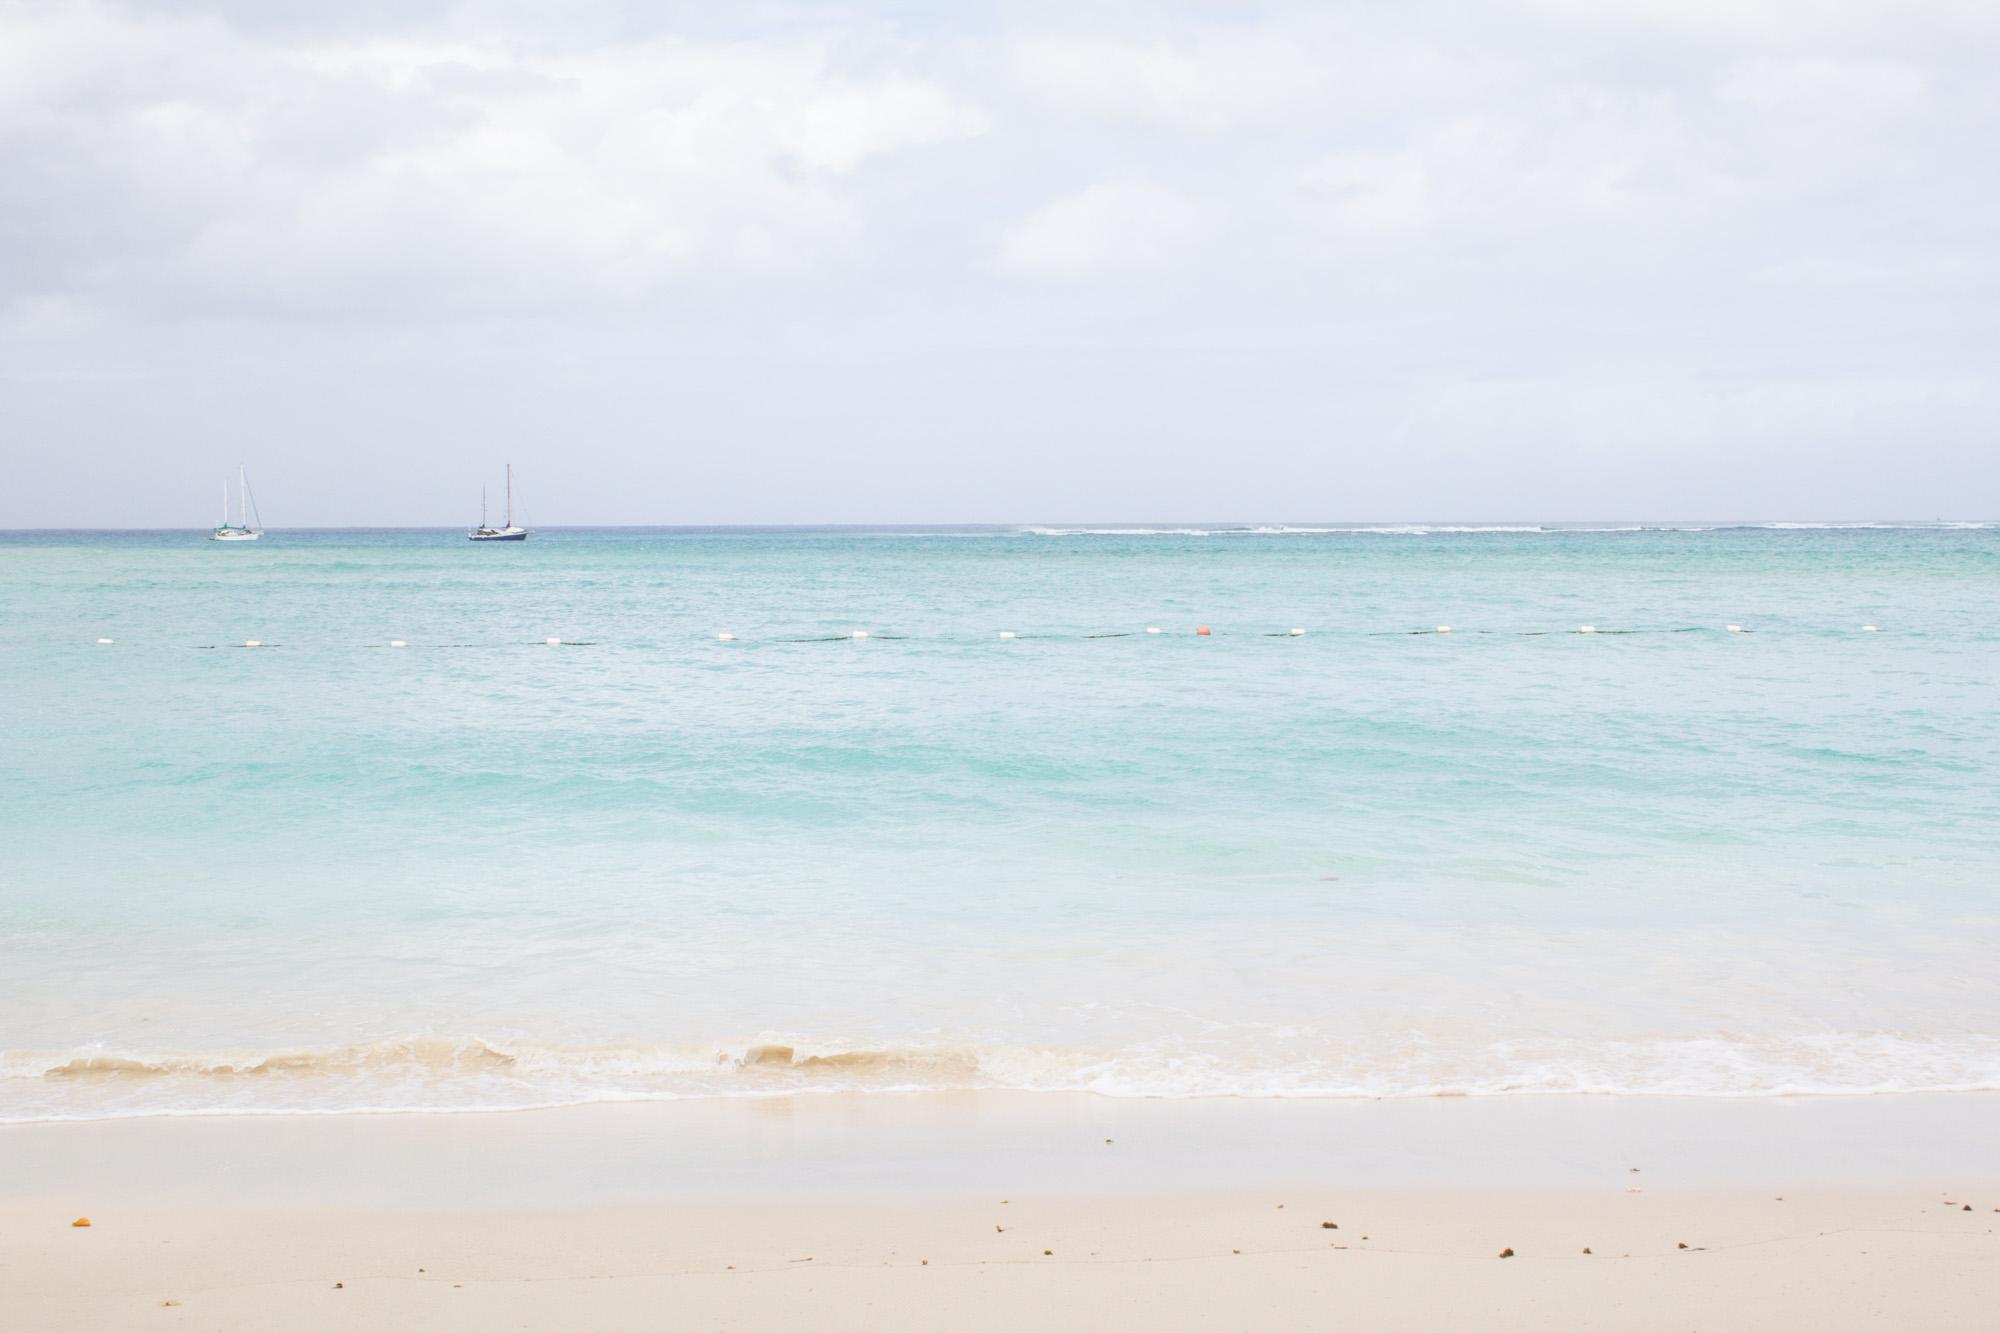 IMG_4870-trinidad-and-tobago-beach-pigeon-point-trisa-taro.jpg